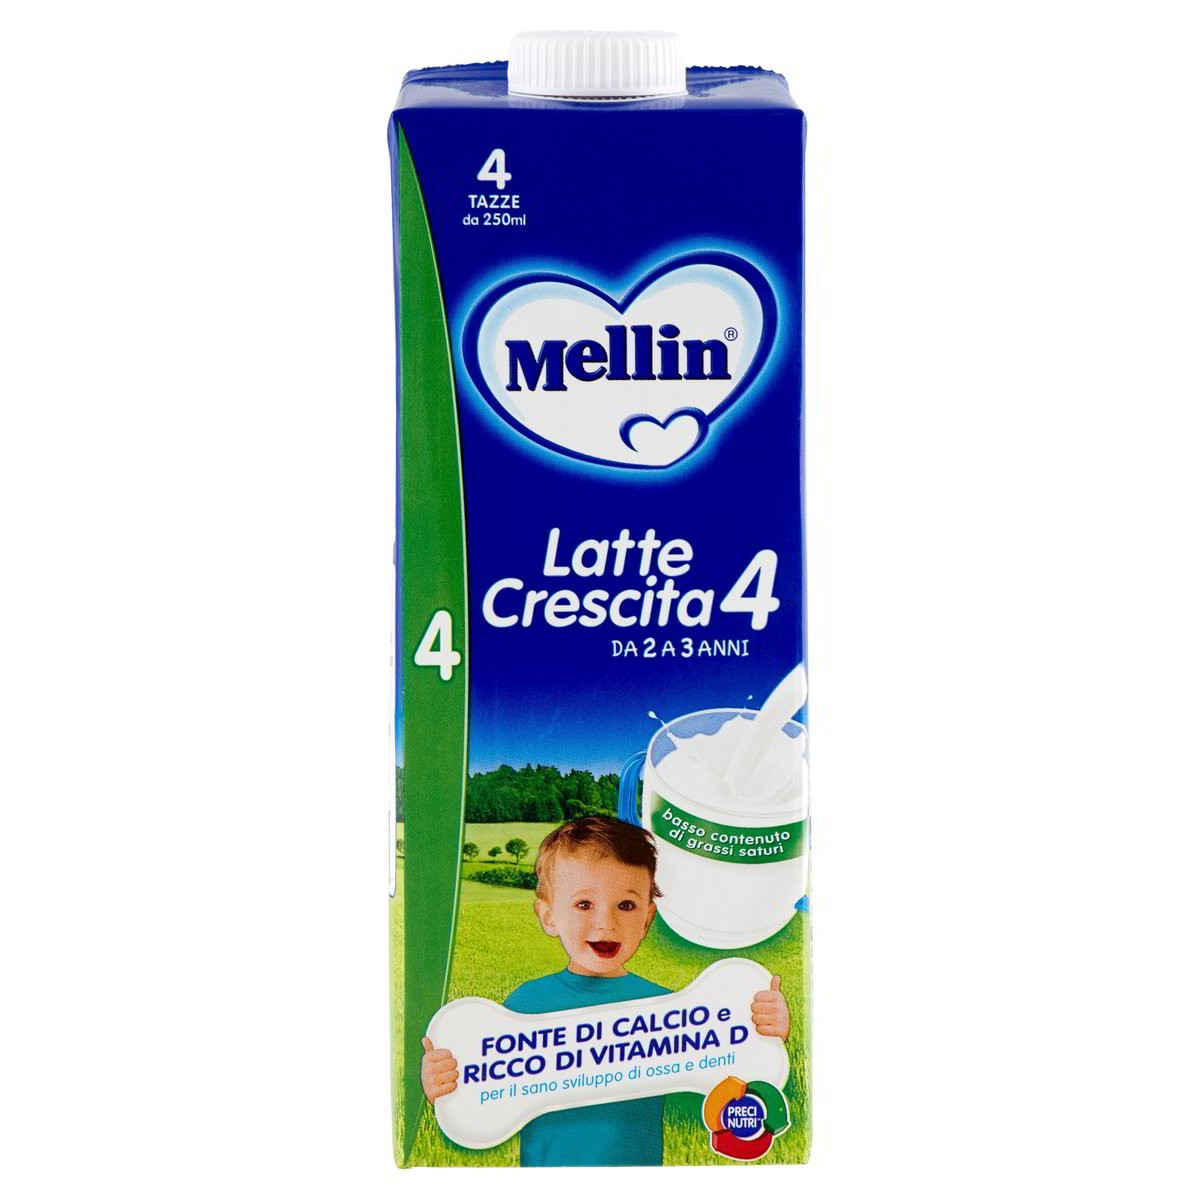 Mellin Latte liquido di crescita 4